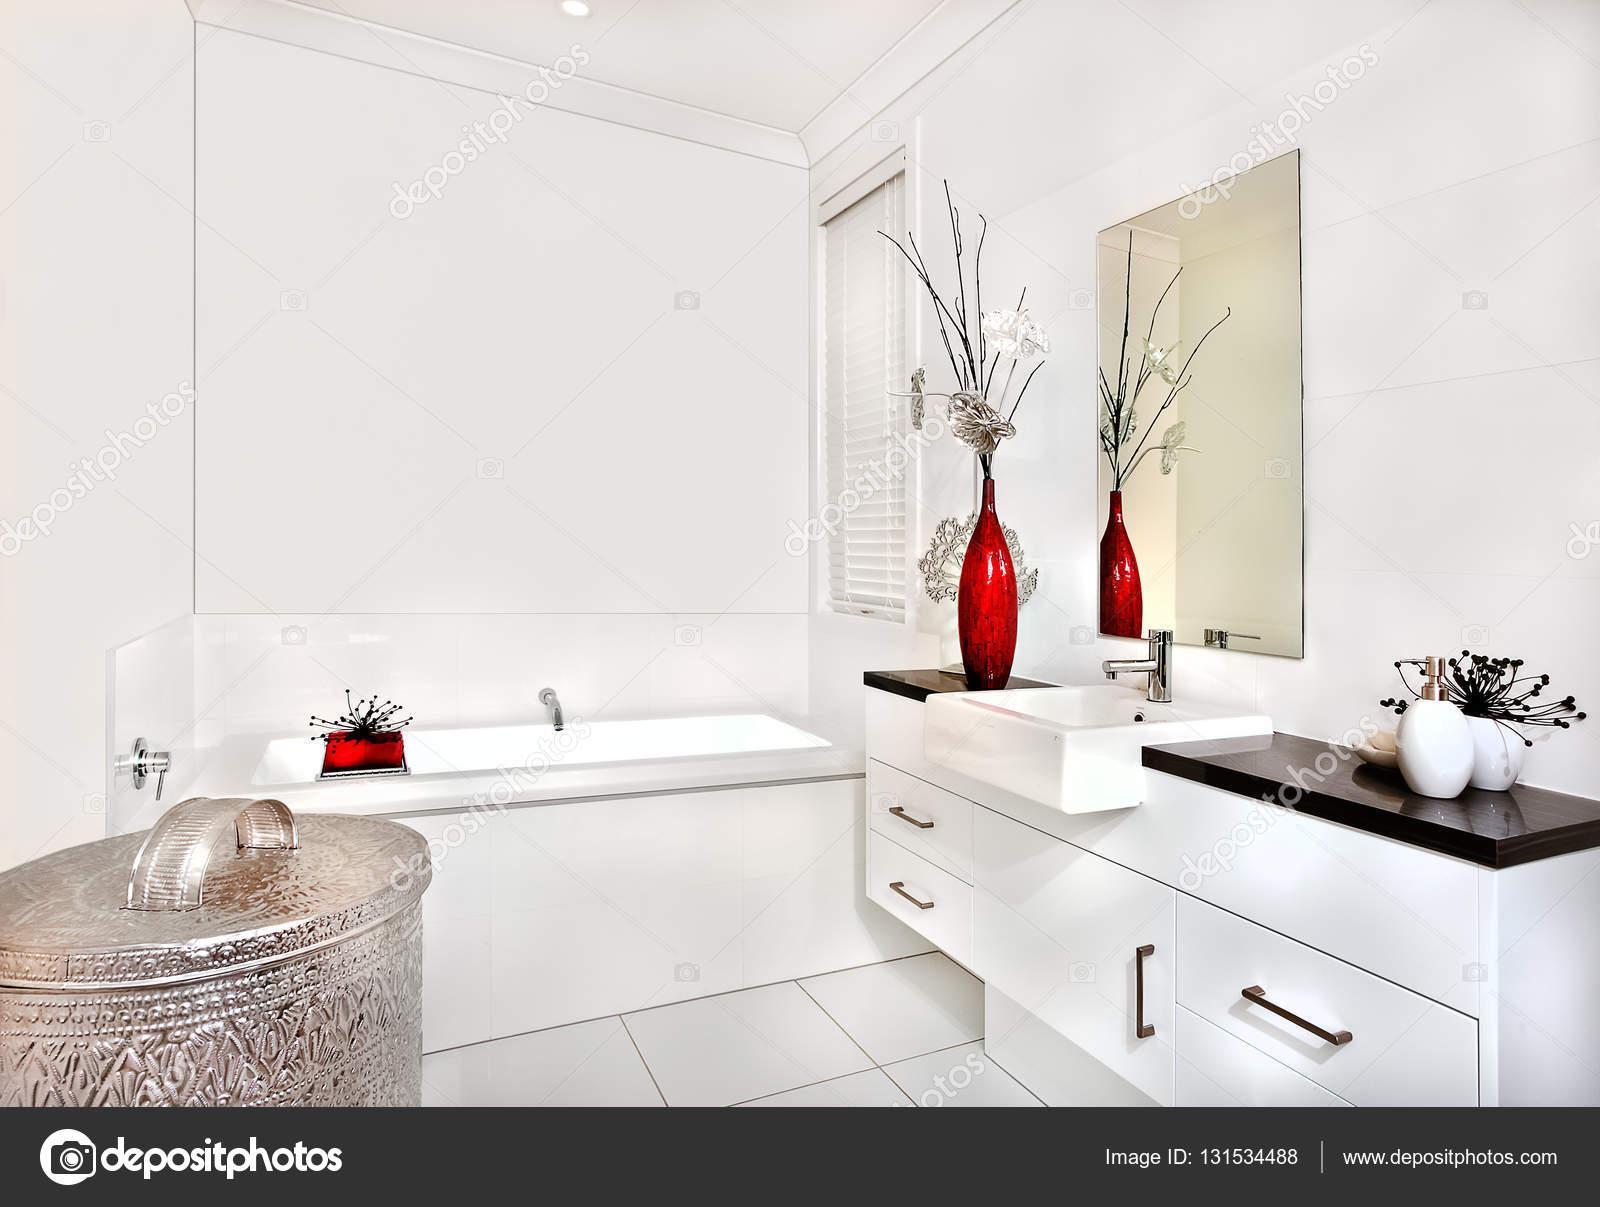 Vasca Da Bagno Per Hotel : Bagno con vasca da bagno e interni di casa moderna o hotel u foto